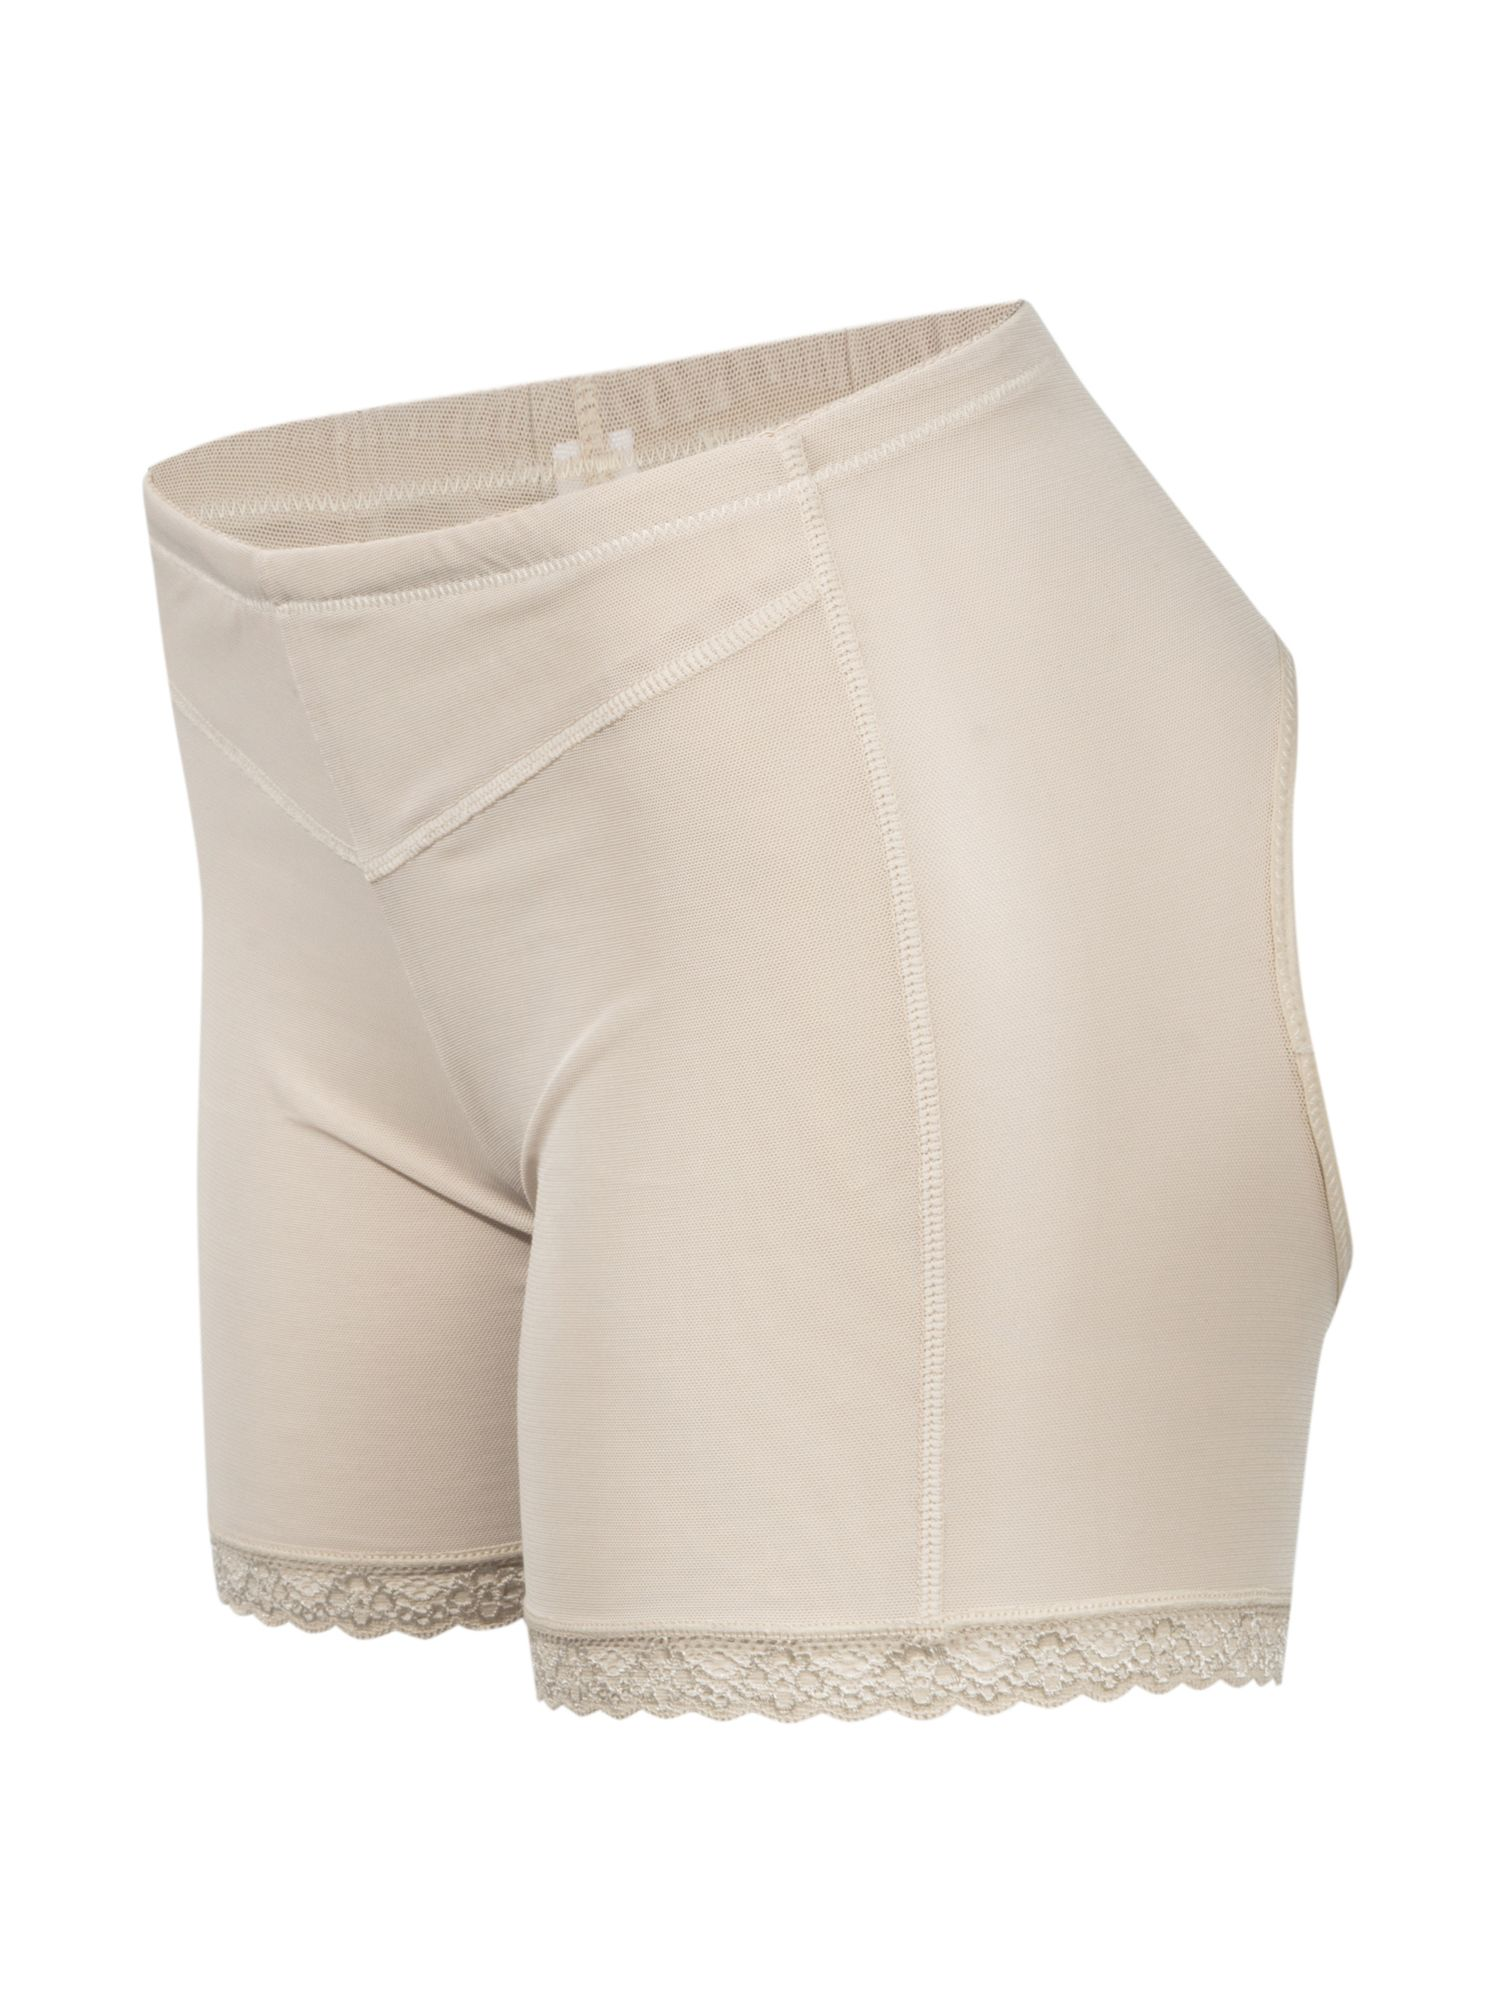 7a41599c7aa03 LELINTA Seamless Butt Lifter Panties Body Shaper Tummy Control Underwear  Thigh Slimming Boyshort for Women 2